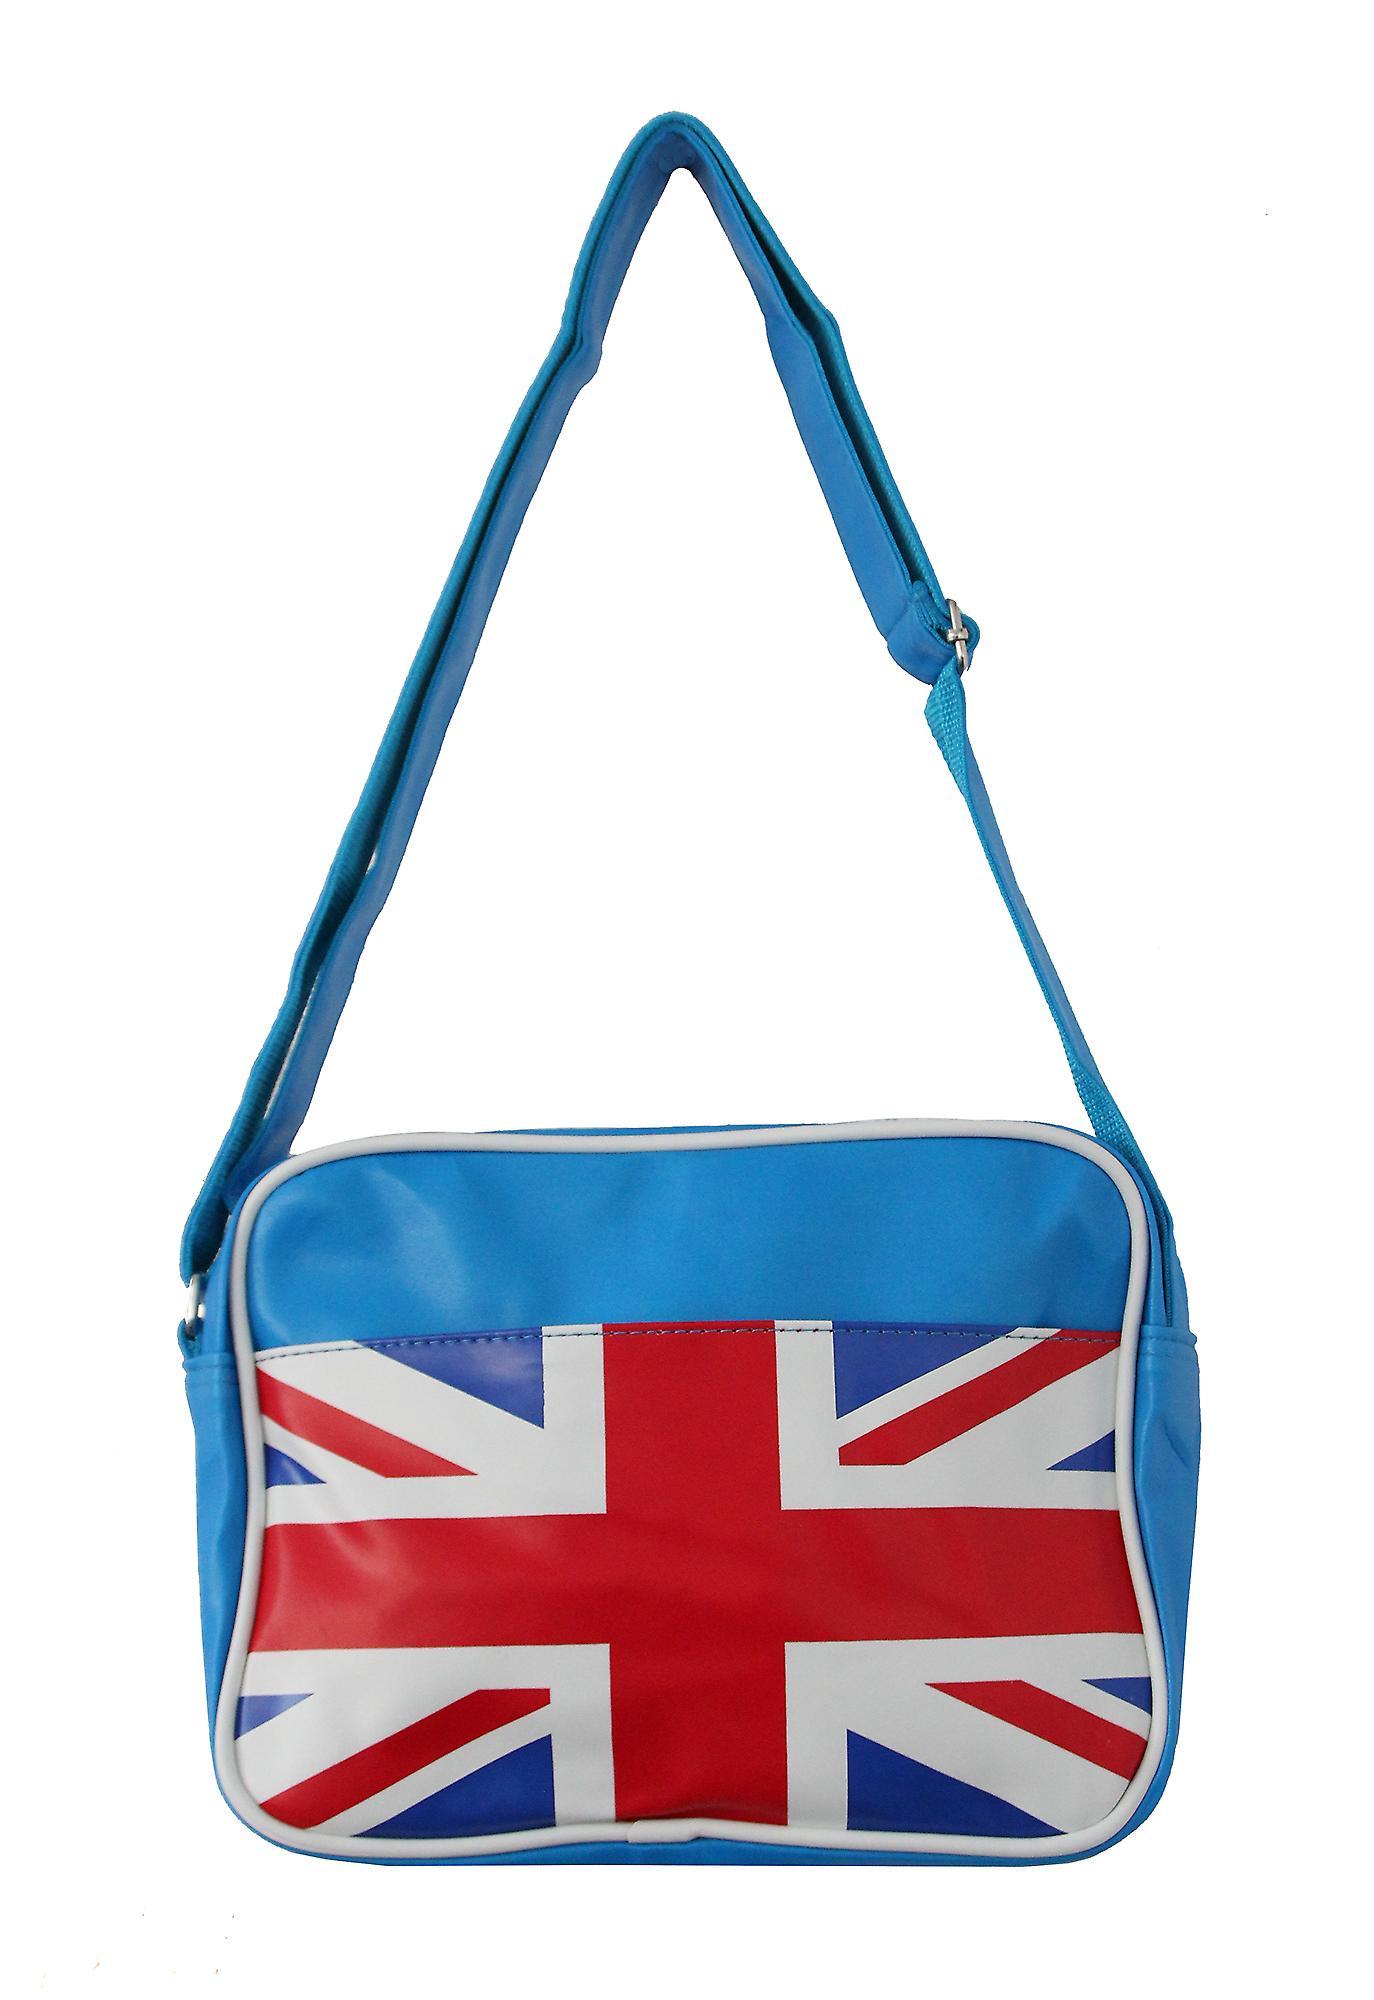 Waooh - Small Shoulder Bag British flag Canly